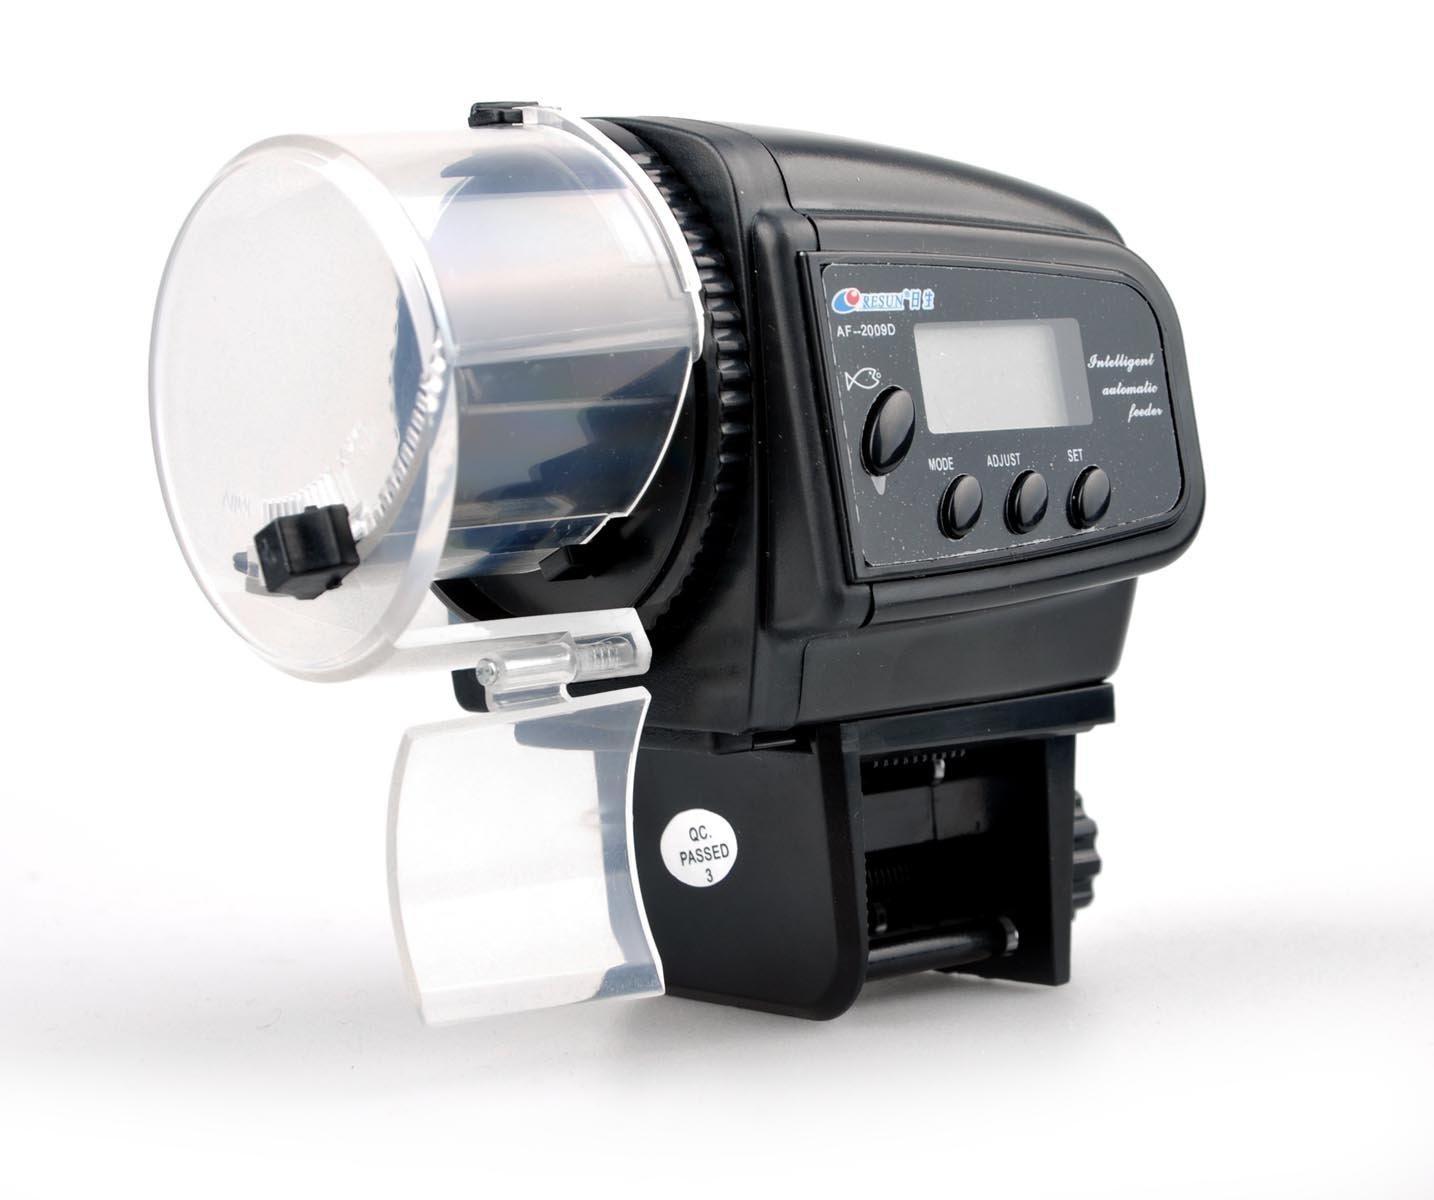 eBoTrade Daily Automatic Fish Feeder, Aquarium Tank Auto Feeders with Timer, Pet Feeding Dispenser